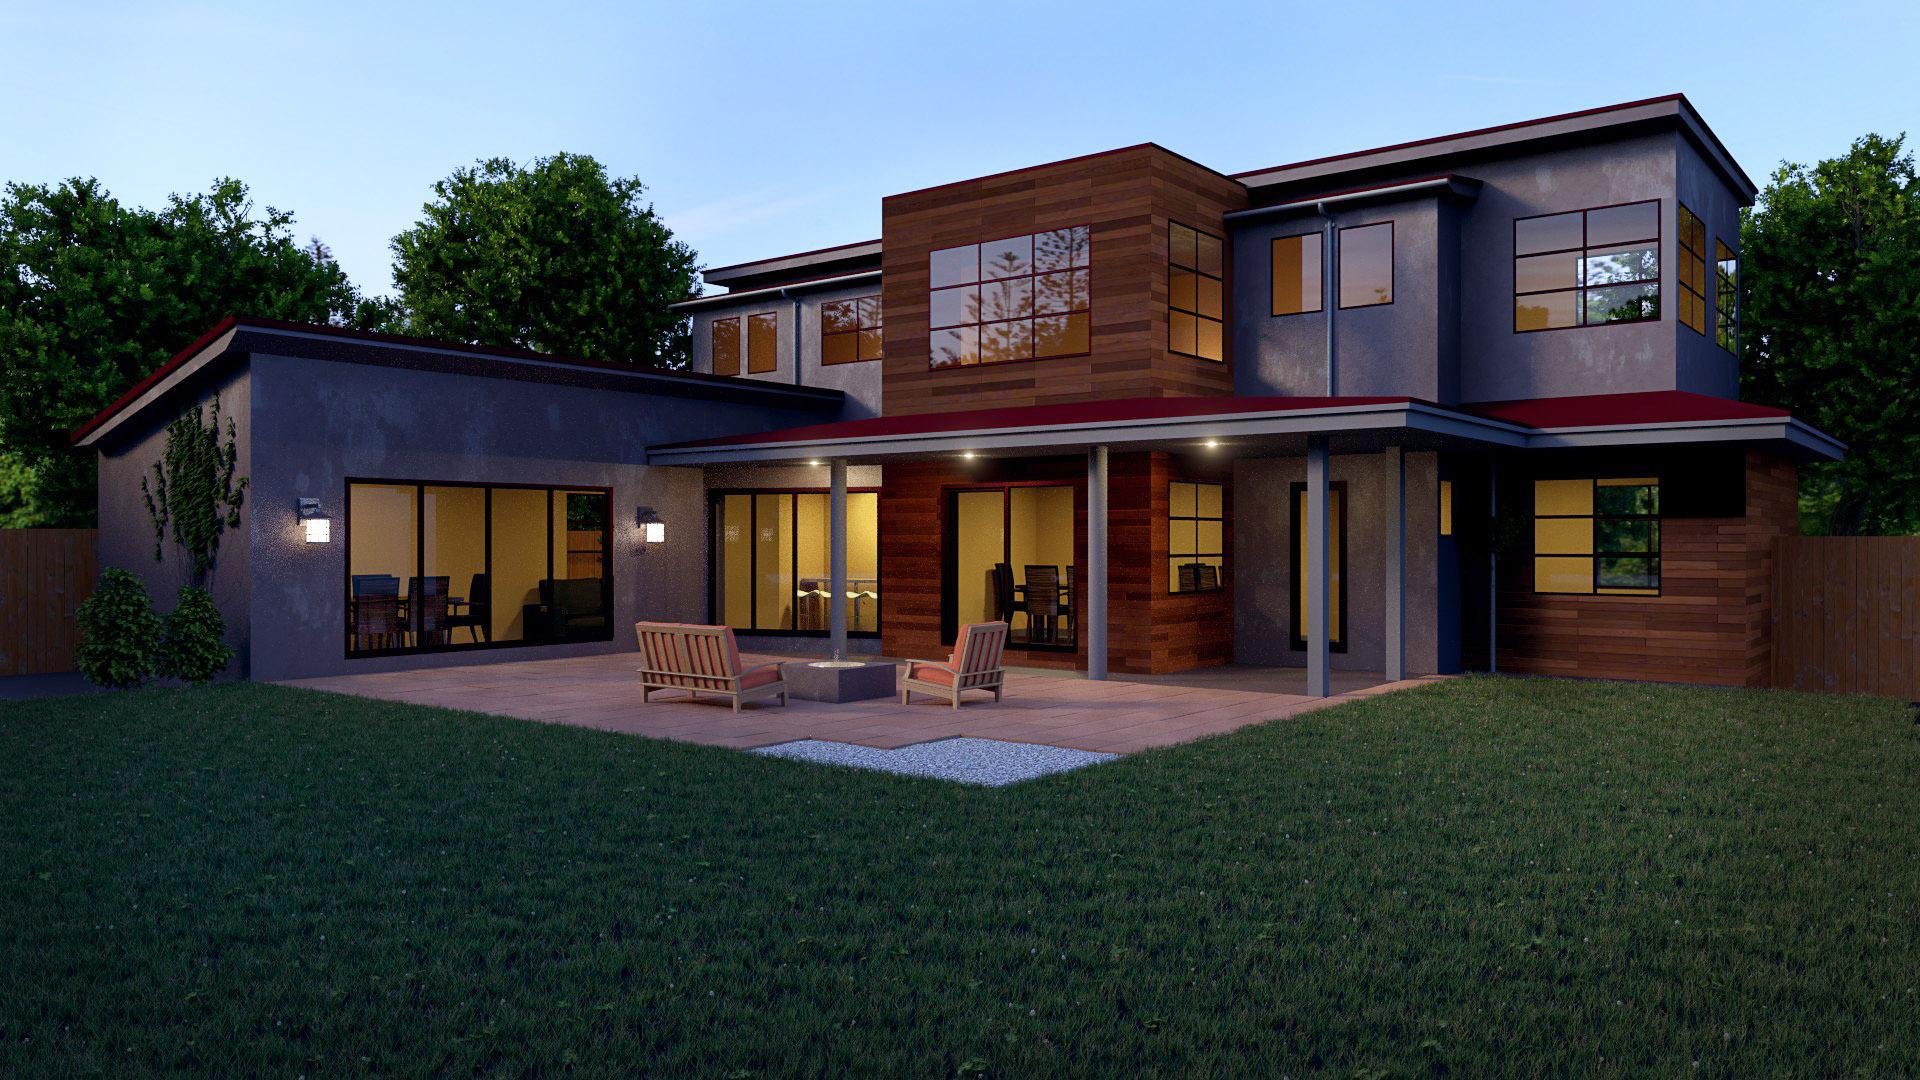 Blender exterior arquitectura casa moderna - Casas arquitectura moderna ...